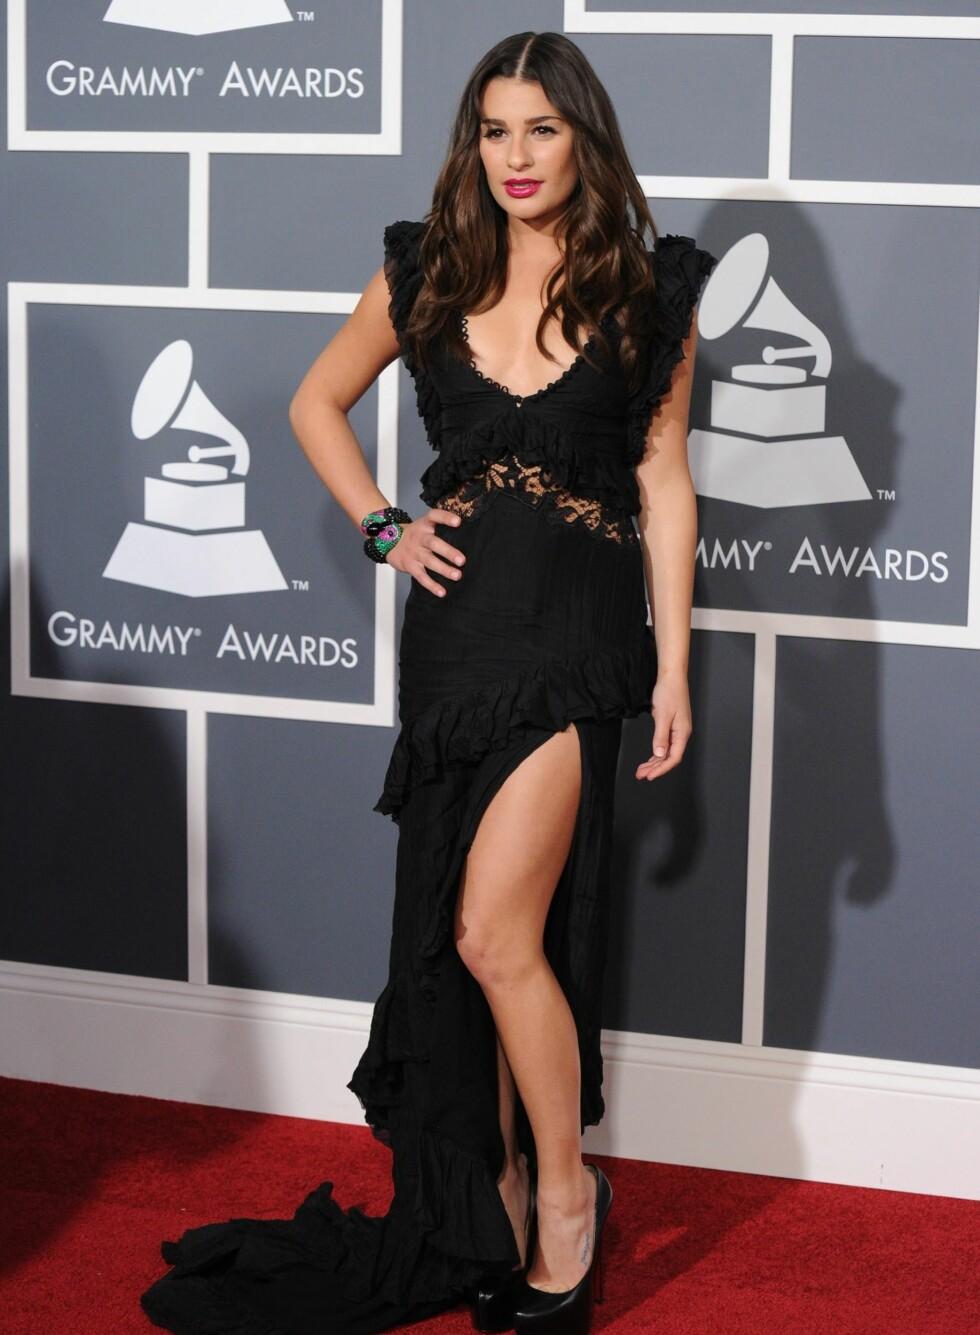 The Glee-stjerne Lea Michele i Emilio Pucci-kjole og Christian Louboutin-pumps. Foto: All Over Press